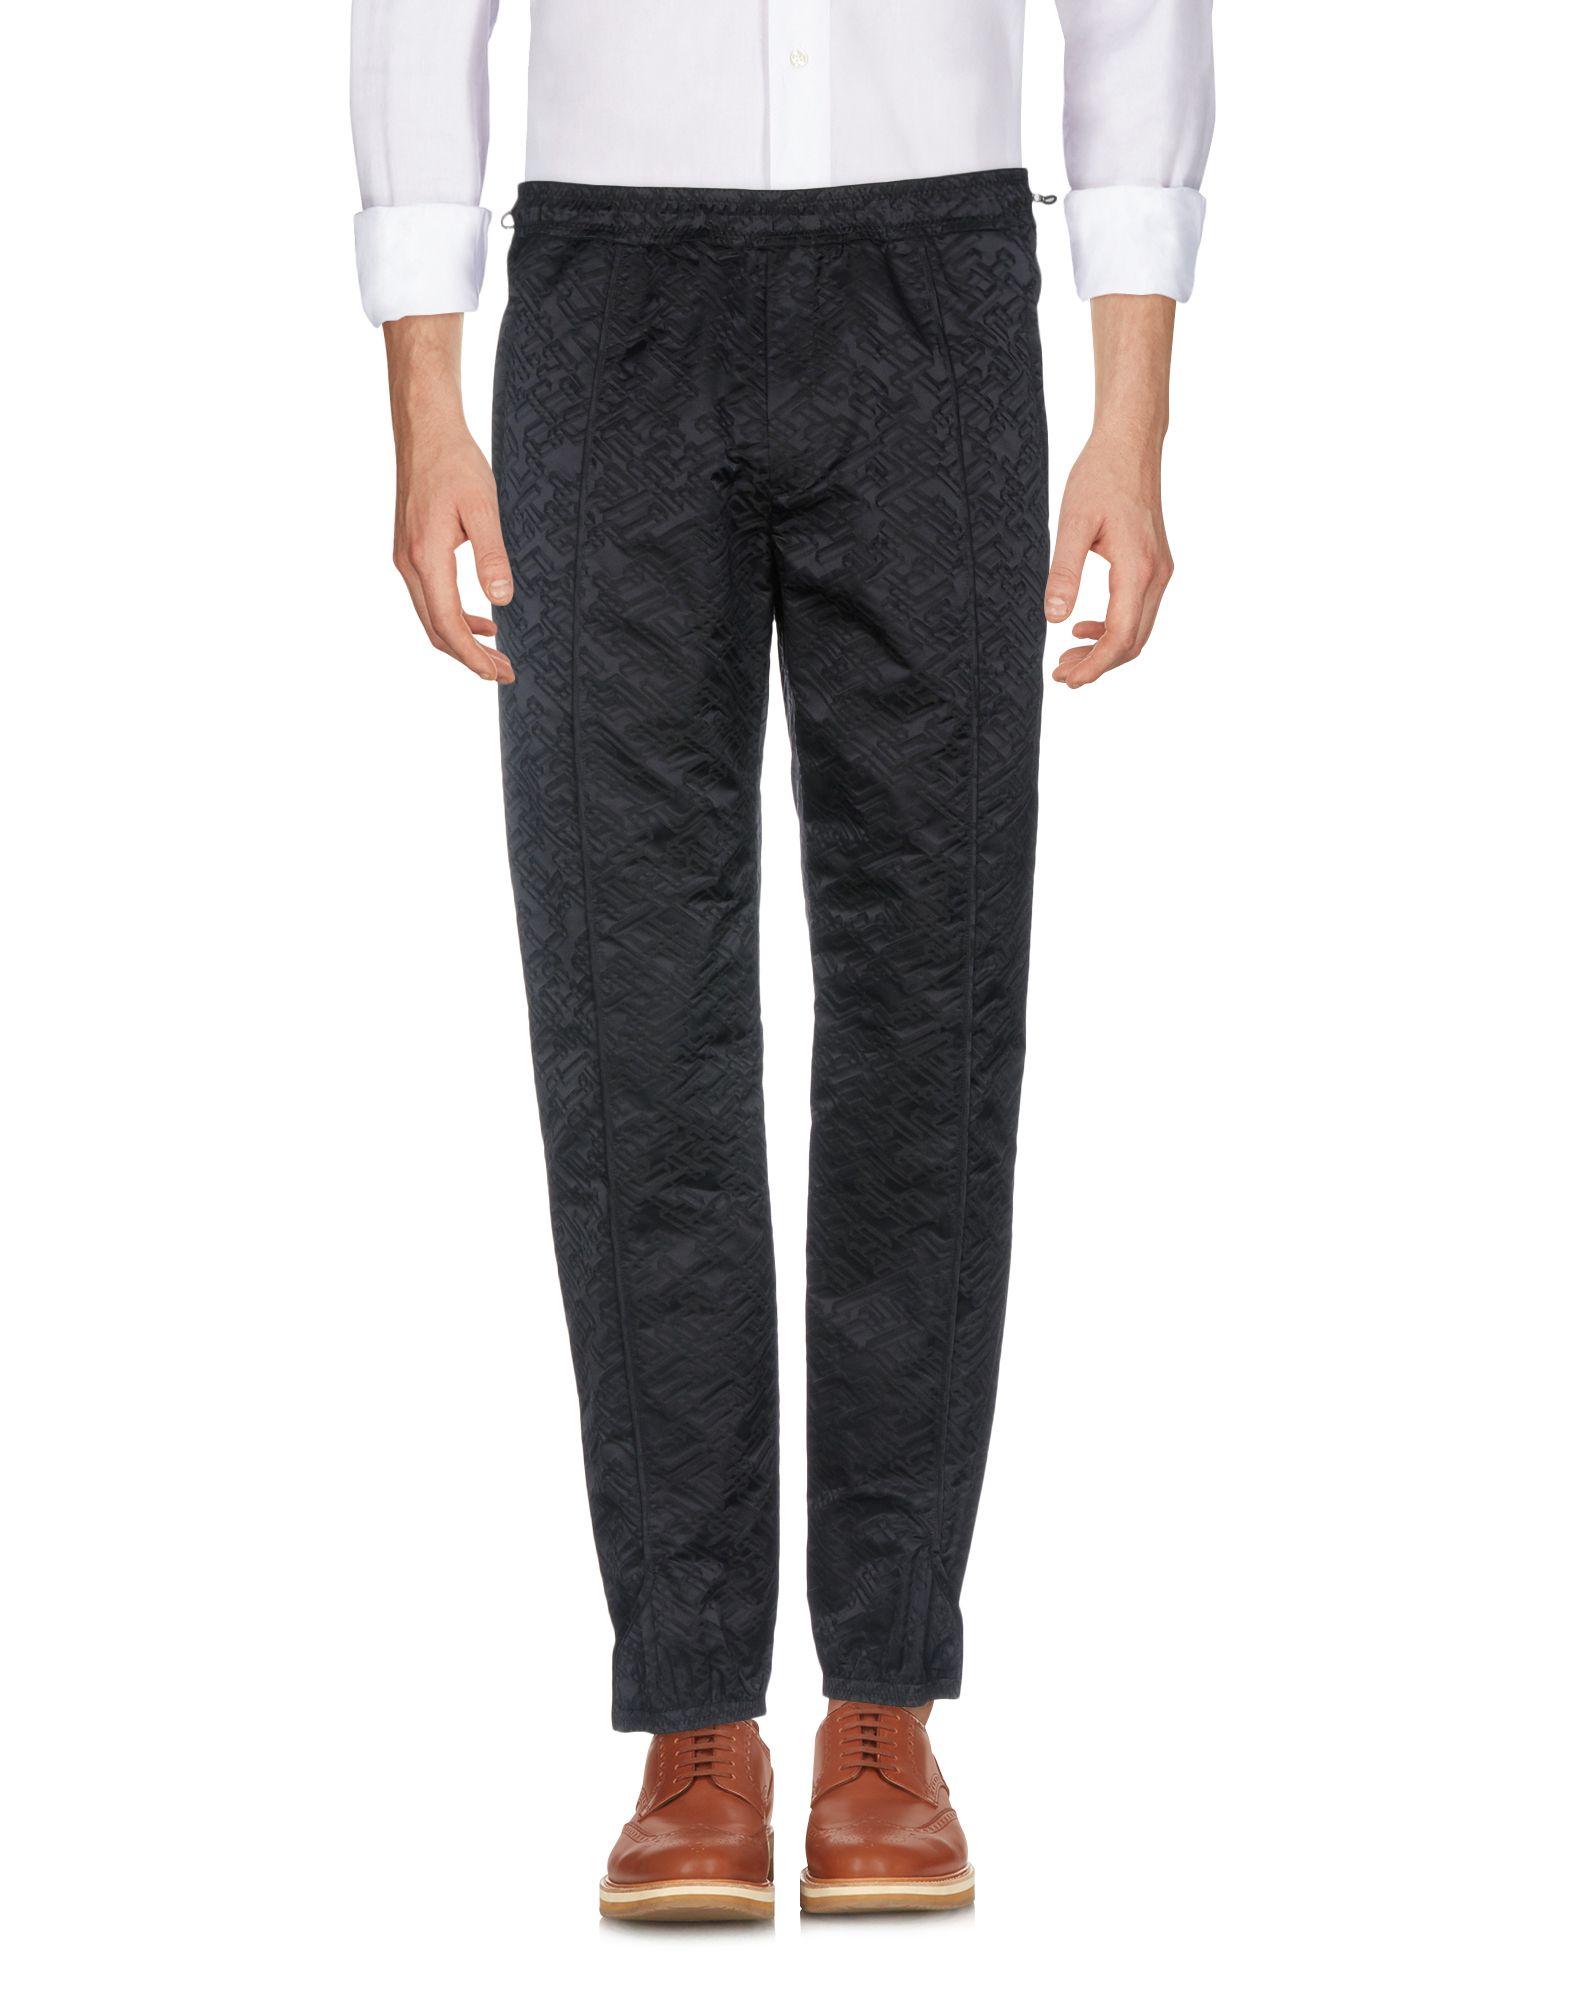 online Pantalone Uomo su Acquista Versace 6qZqwxgt